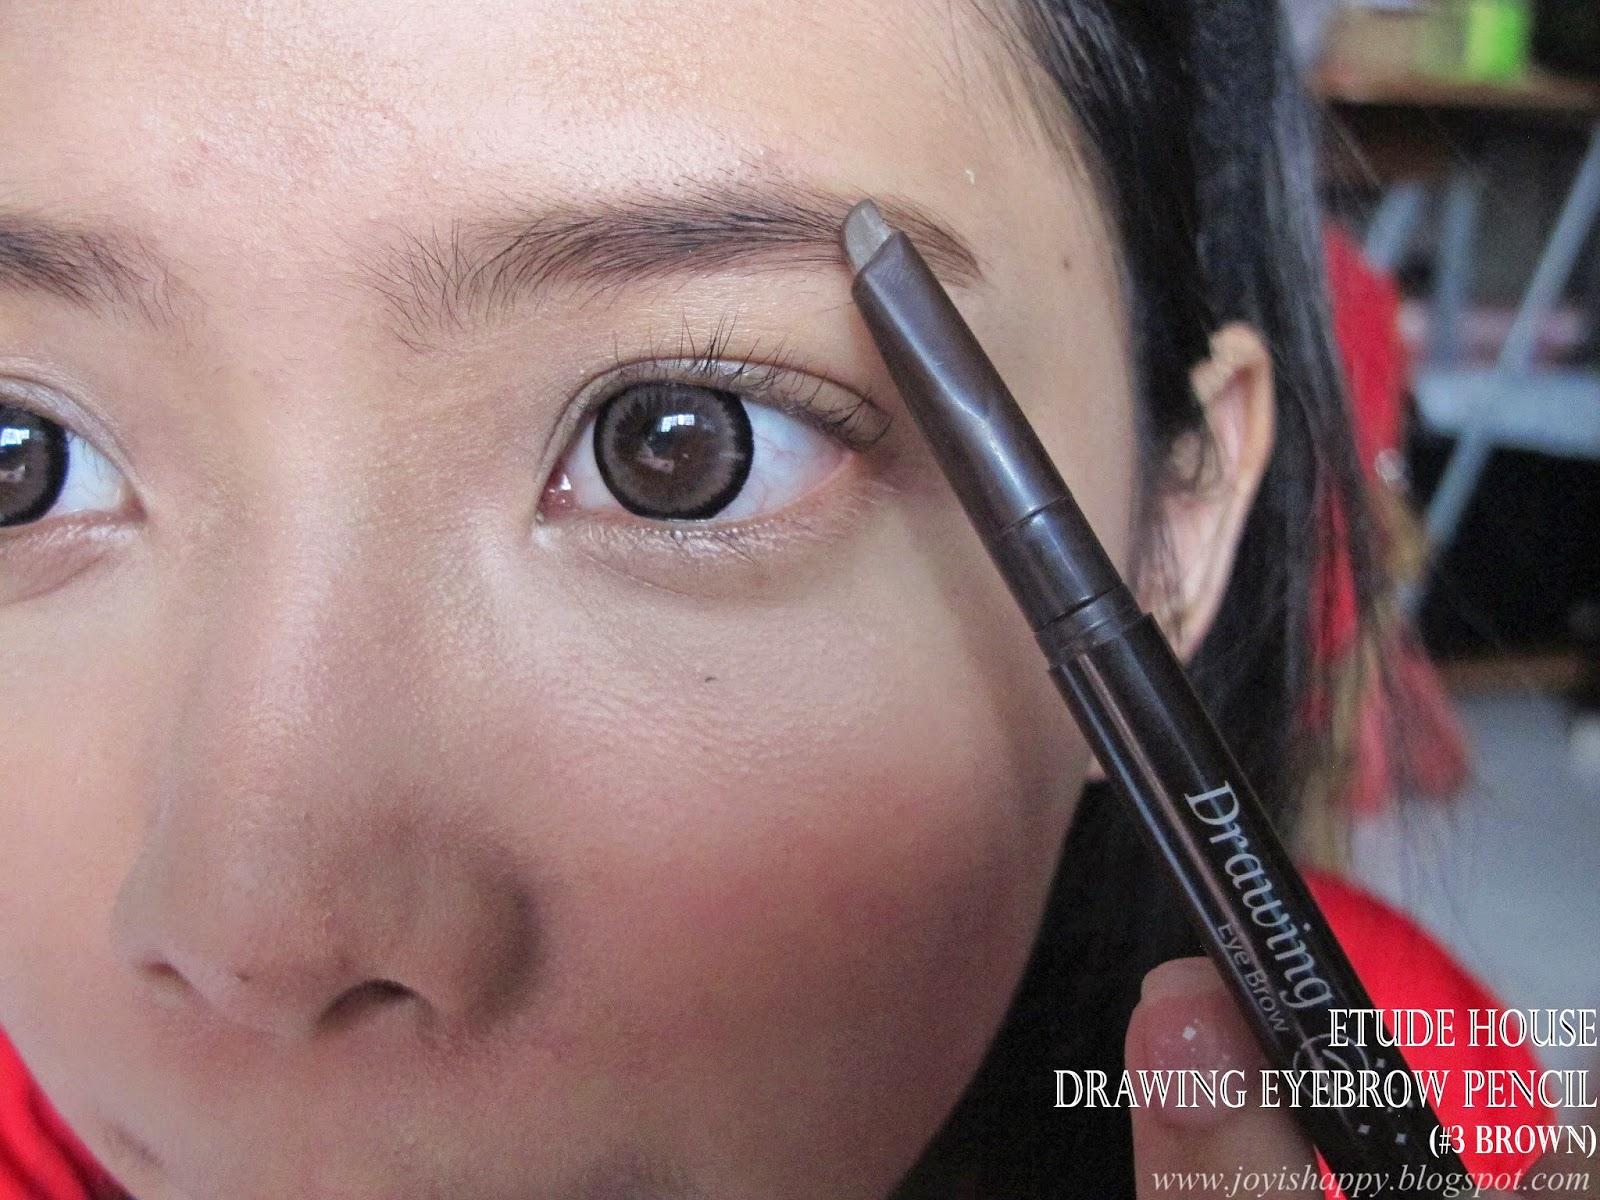 etude house AD drawing eyebrow pencil #3 brown